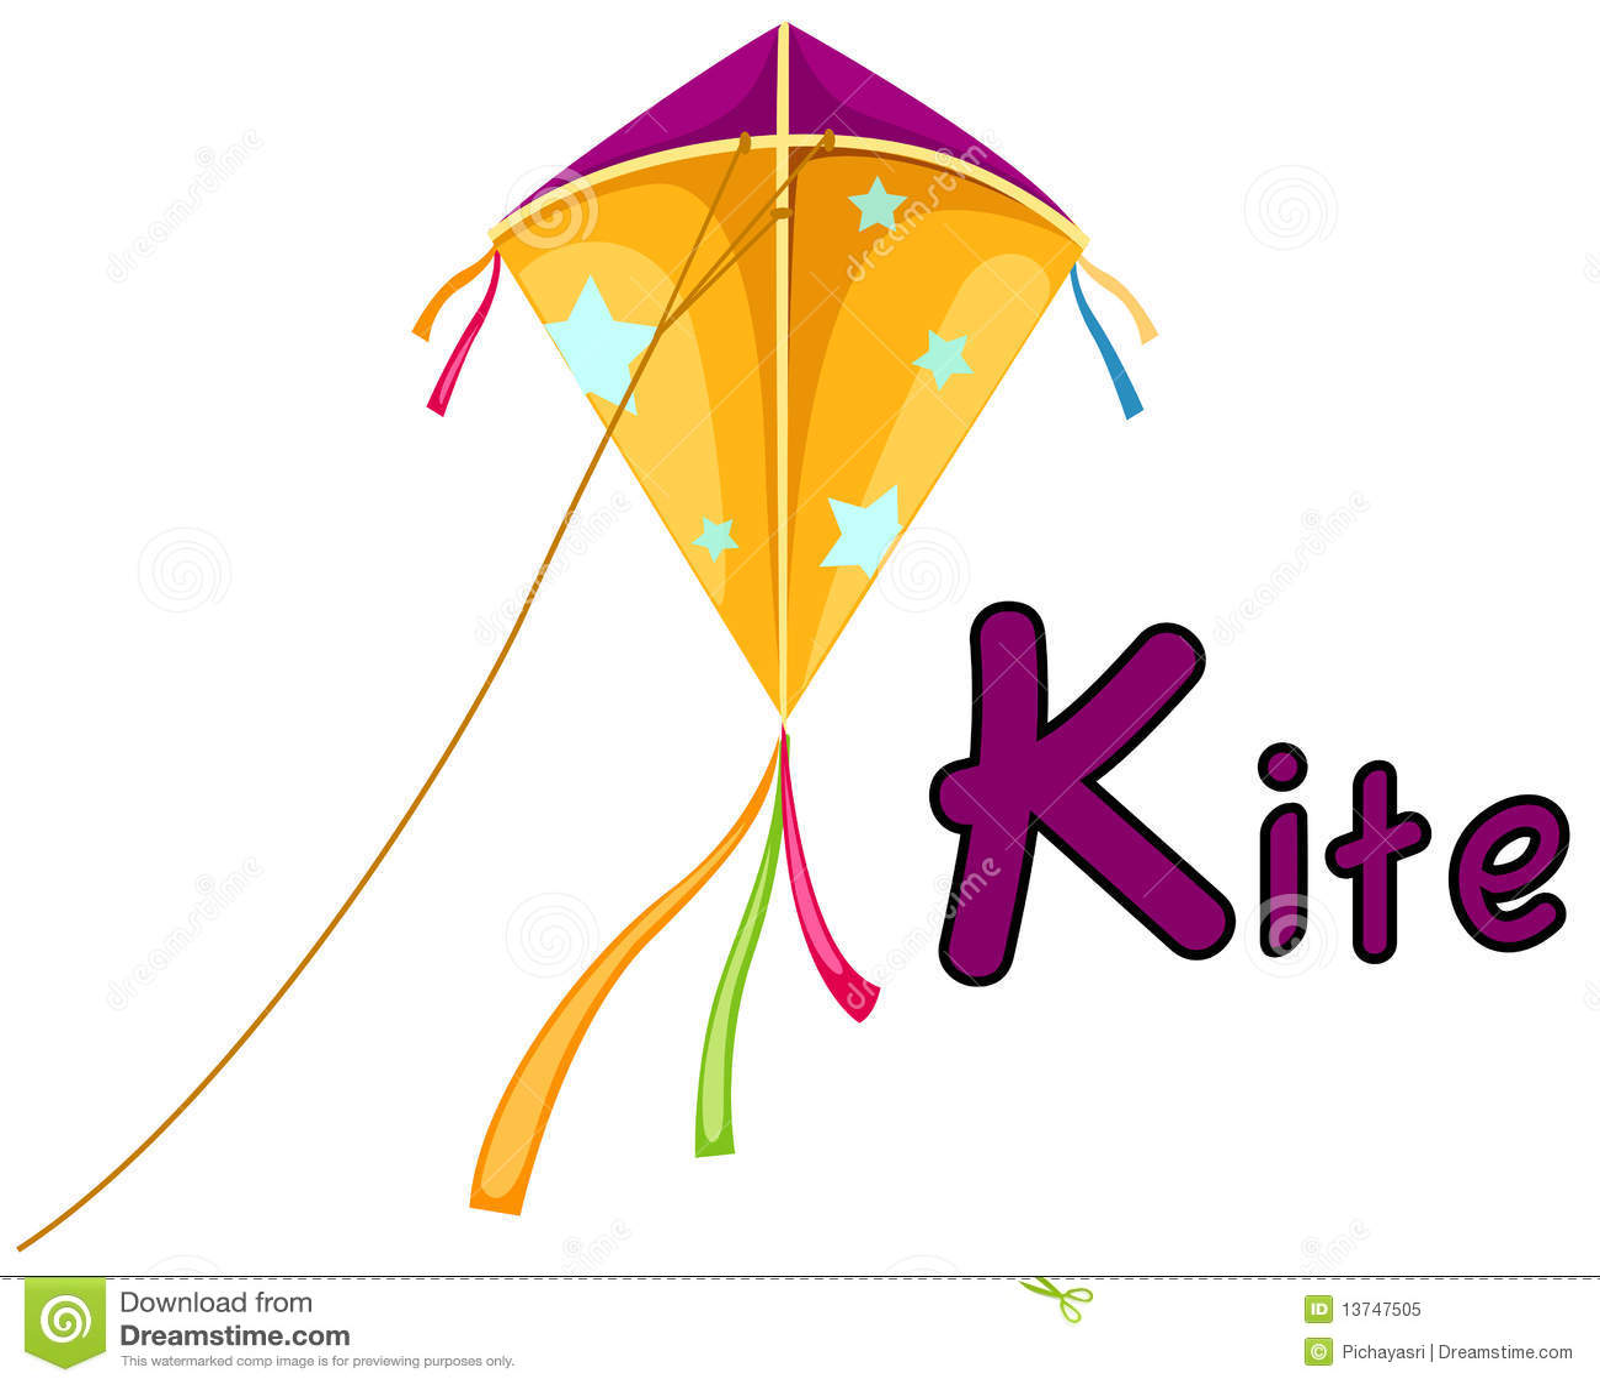 Alphabet K For Kite Royalty Free Stock Photo